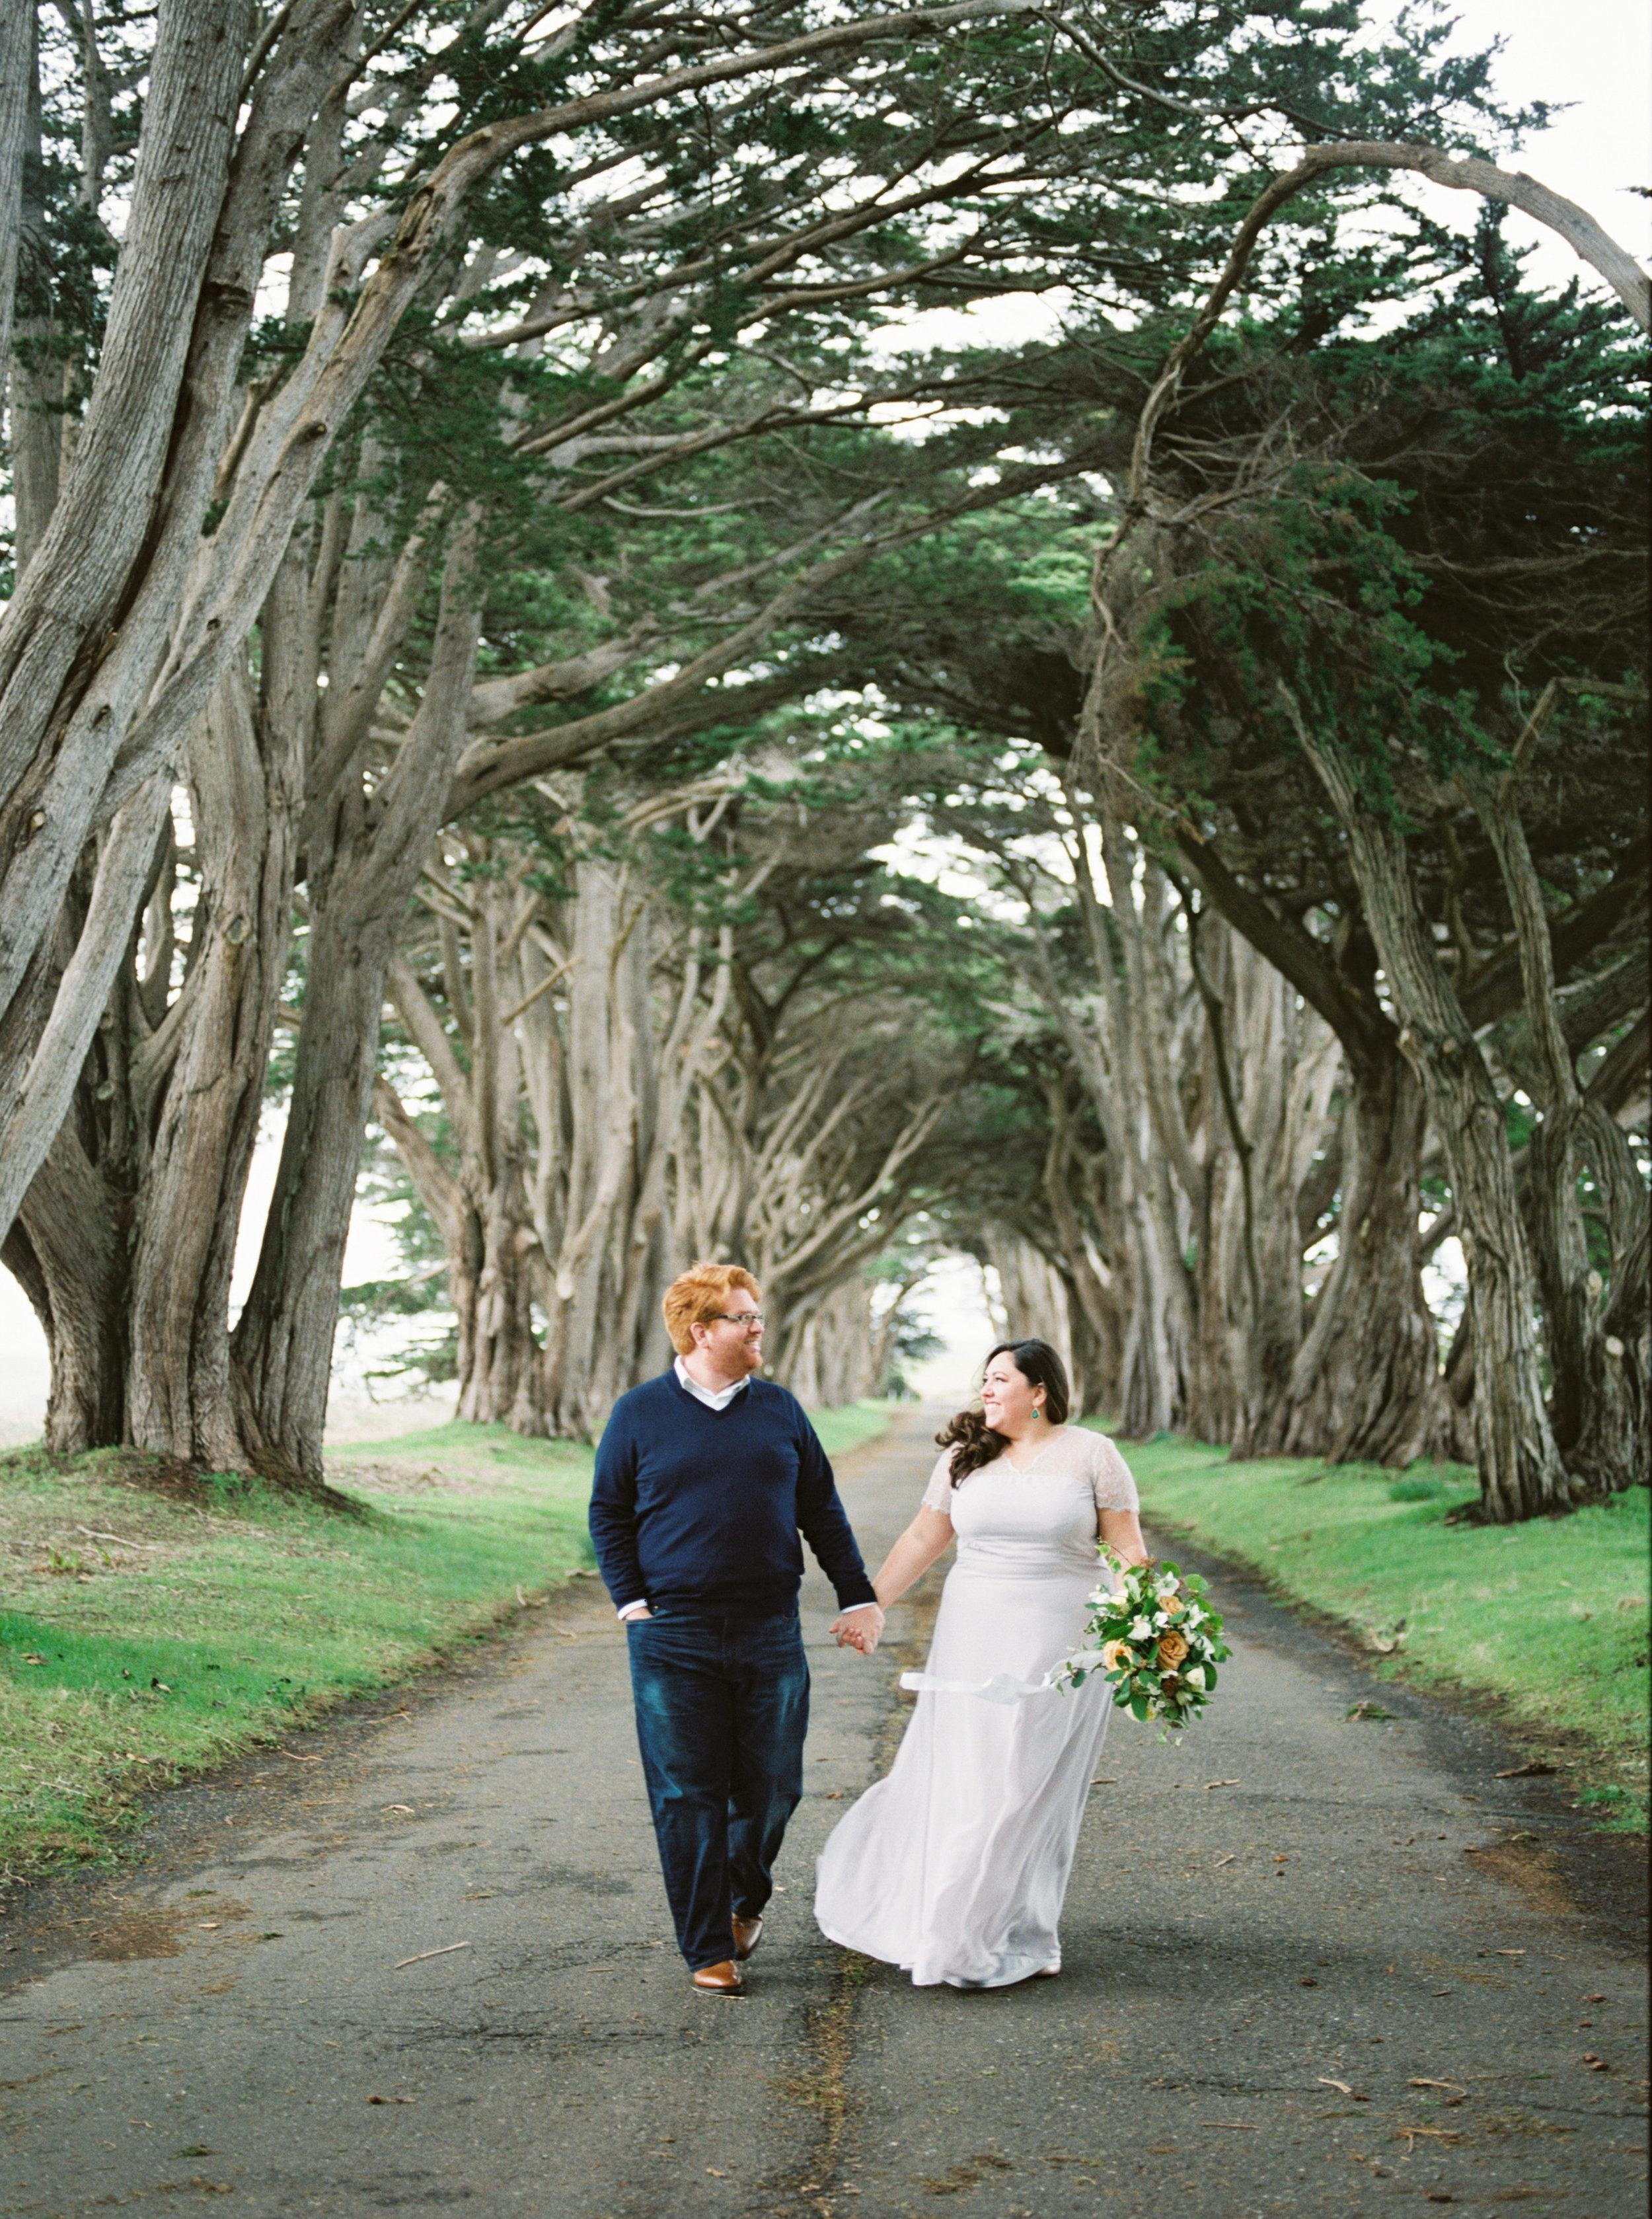 Andrea_and_Josh_Engagement_65.jpg